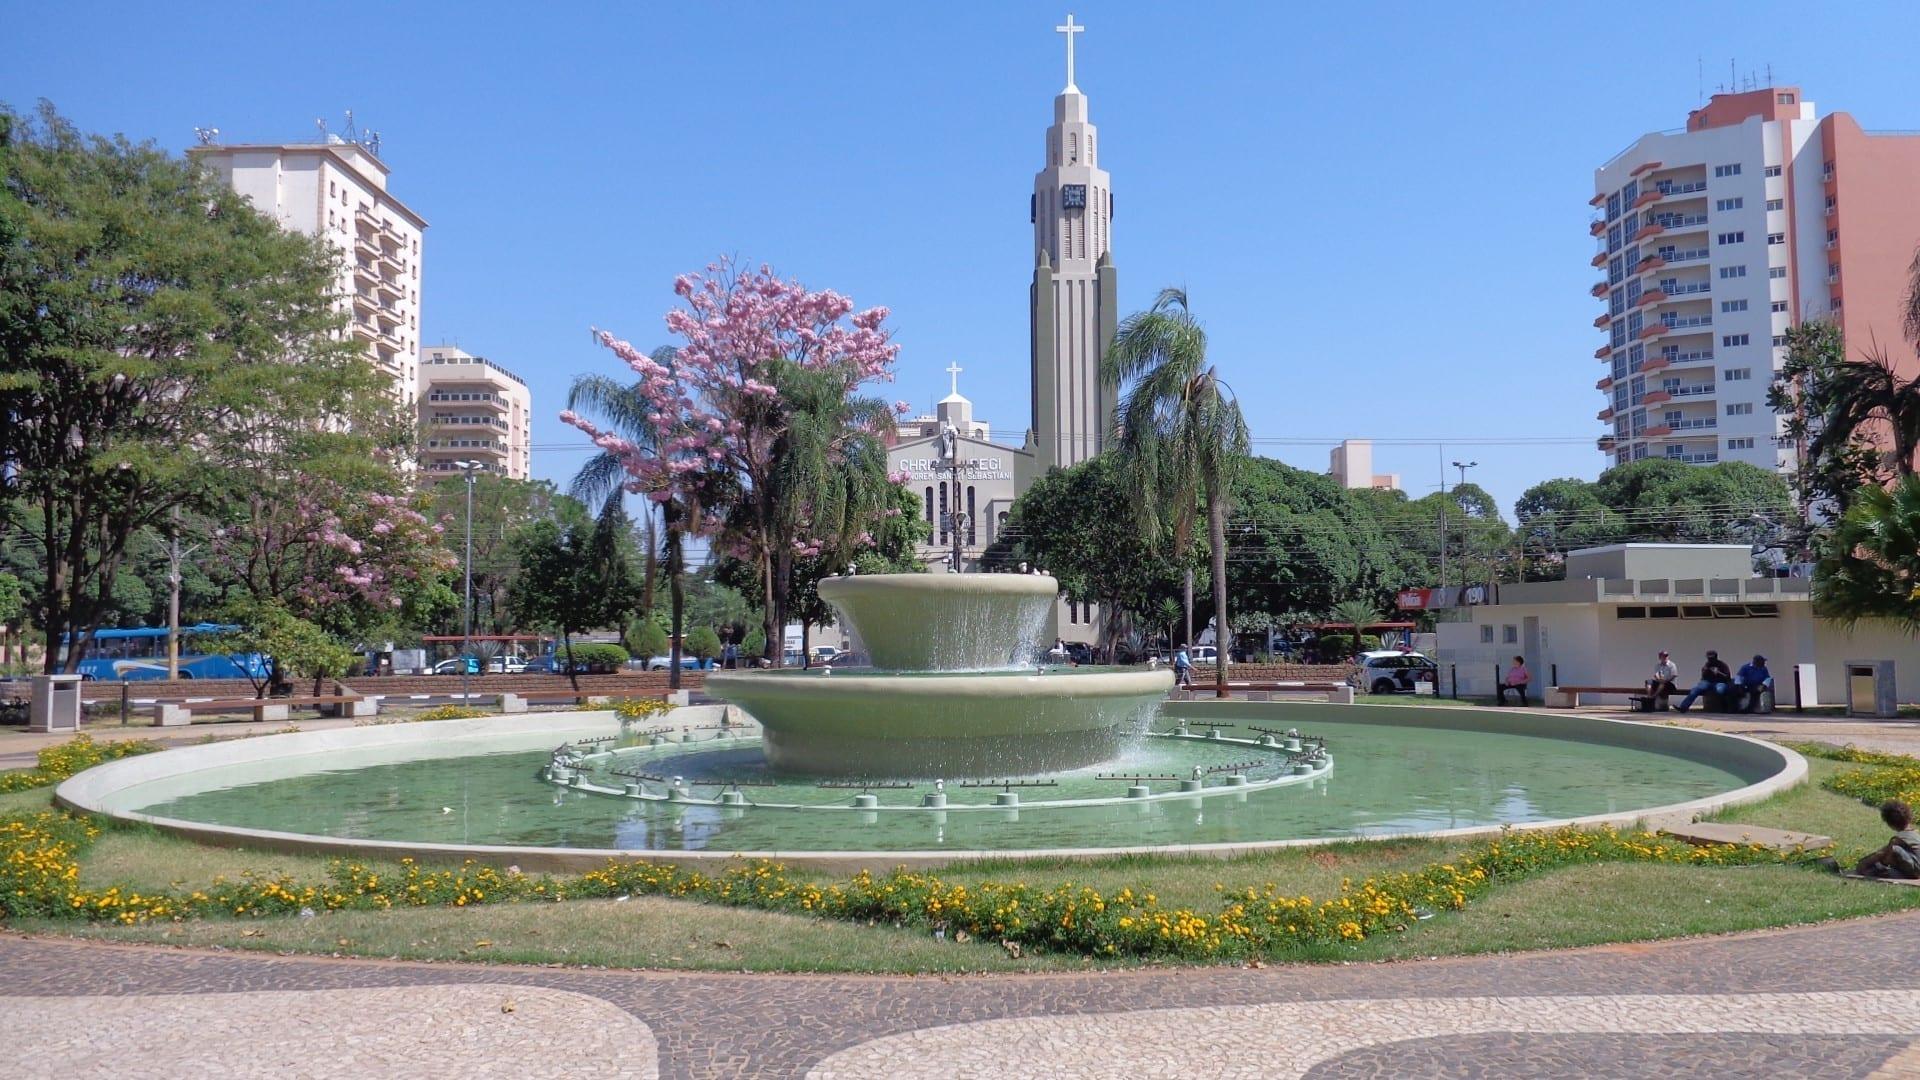 La Catedral de San Sebastián y la Plaza 9 de Julio Presidente Prudente Brasil